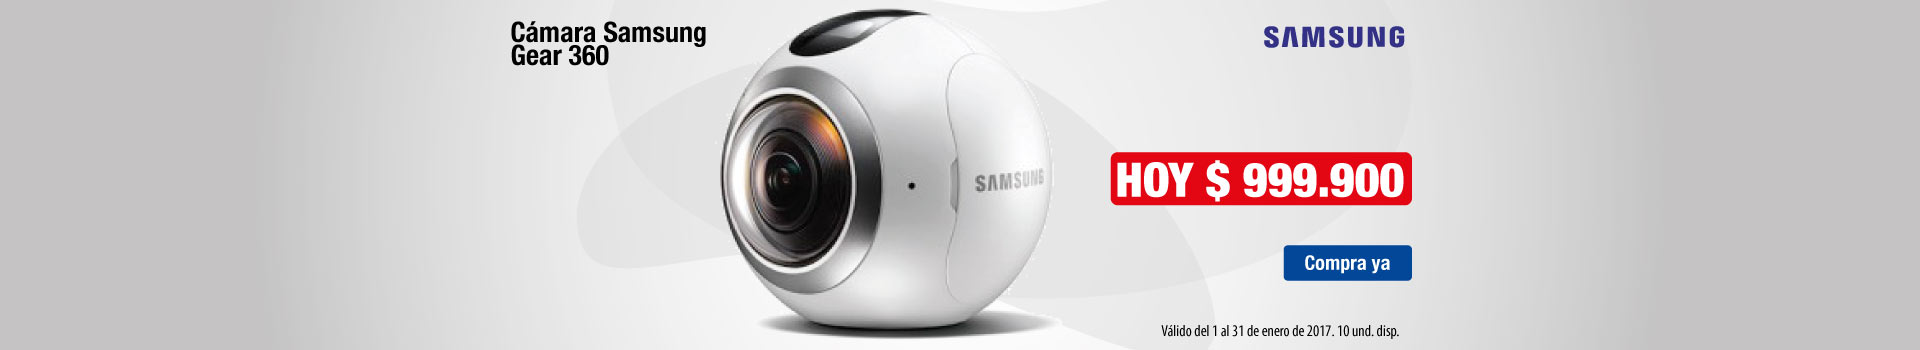 HIPER AK KT - Cámara SAMSUNG Gear 360 - Ene24